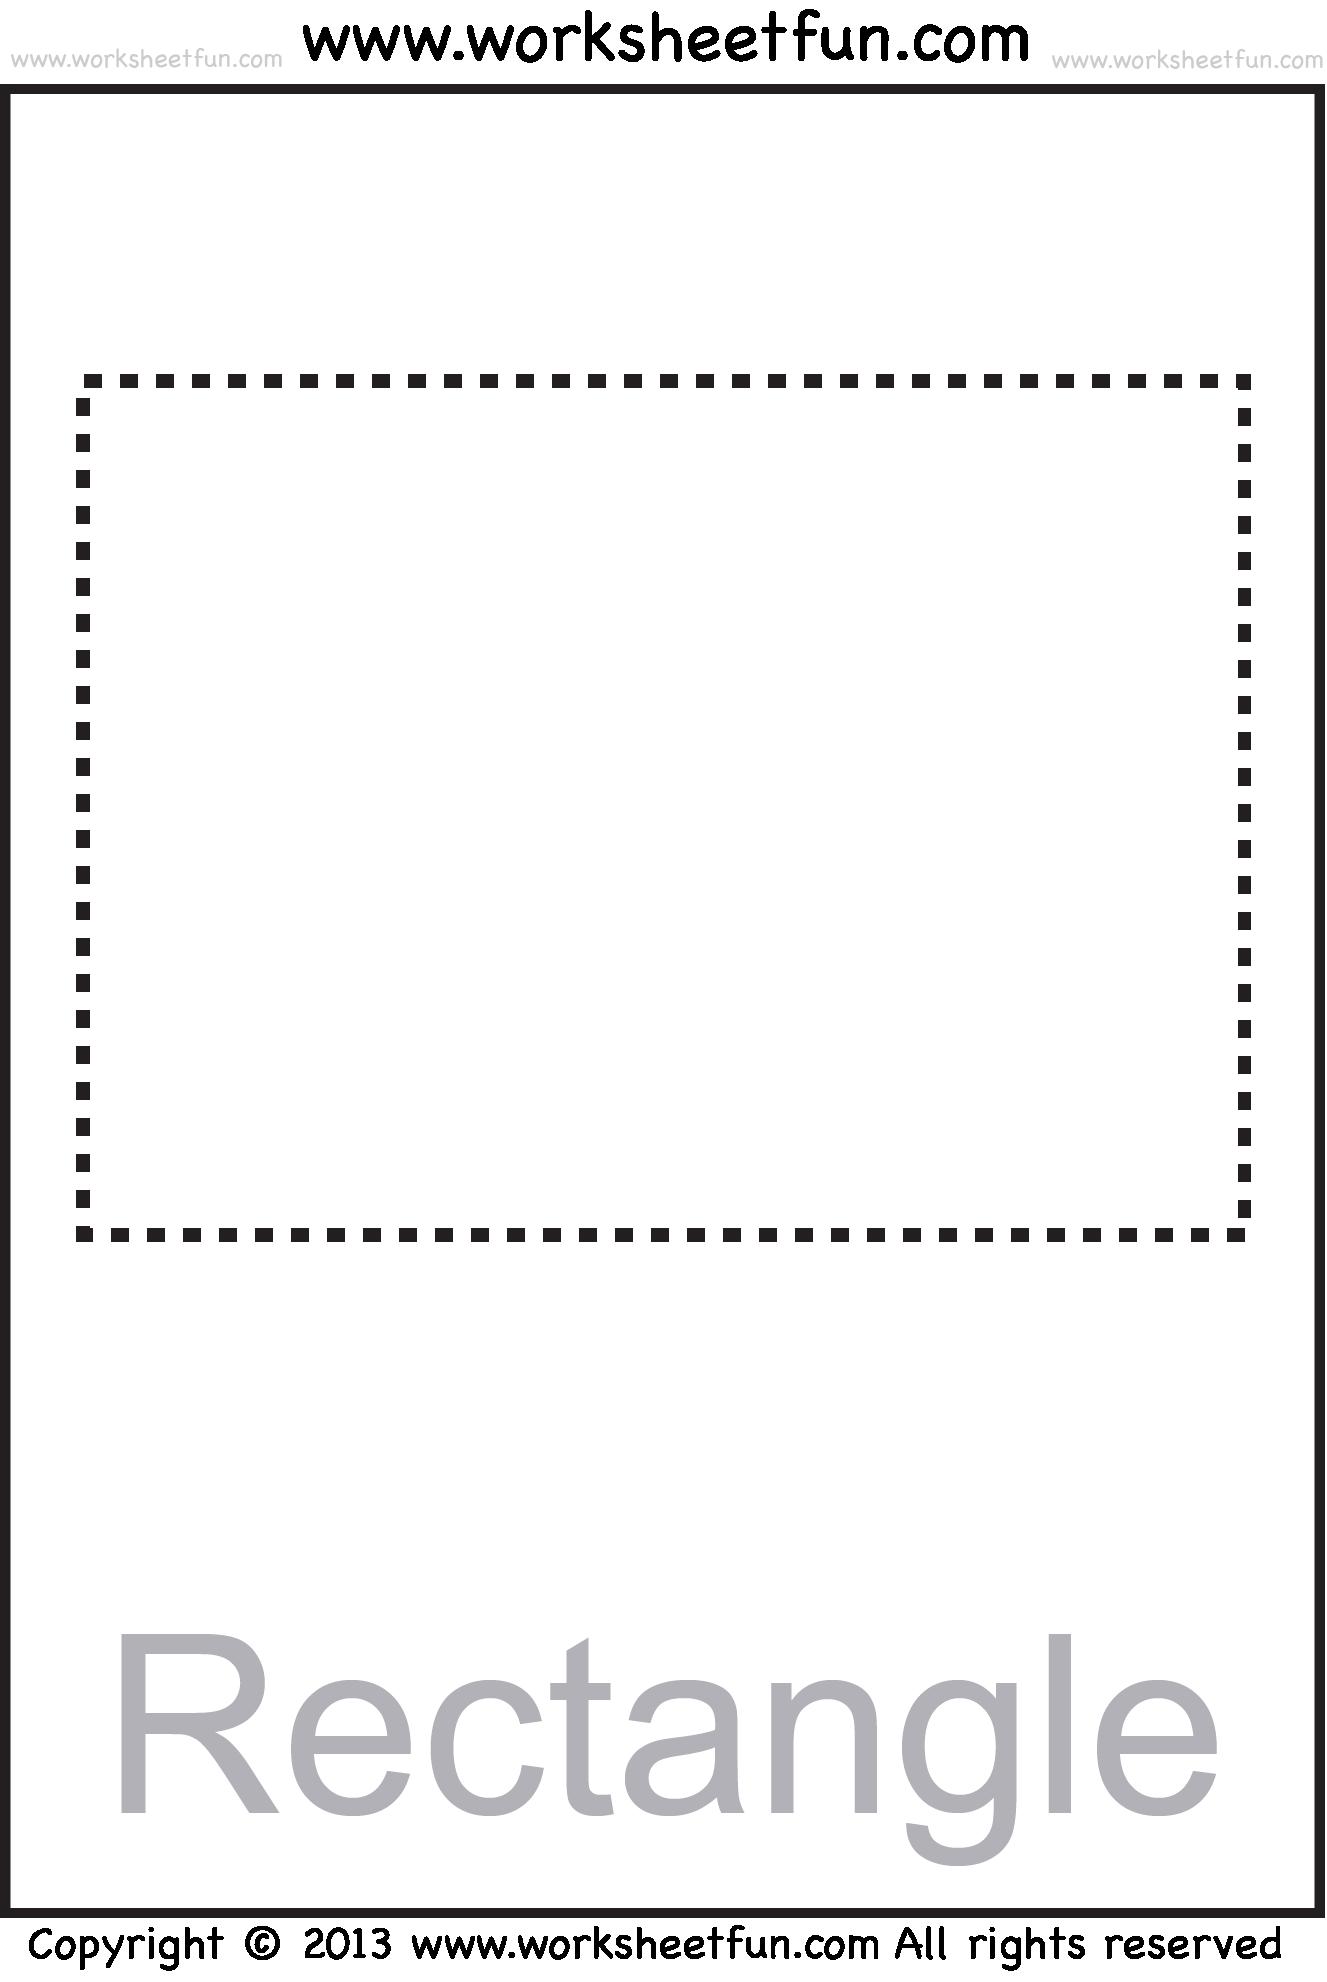 Formas Y Figuras Geometricas Basicas Dibujos De Figuras Geometricas Tipos De Figuras Geometricas Figuras Geometricas